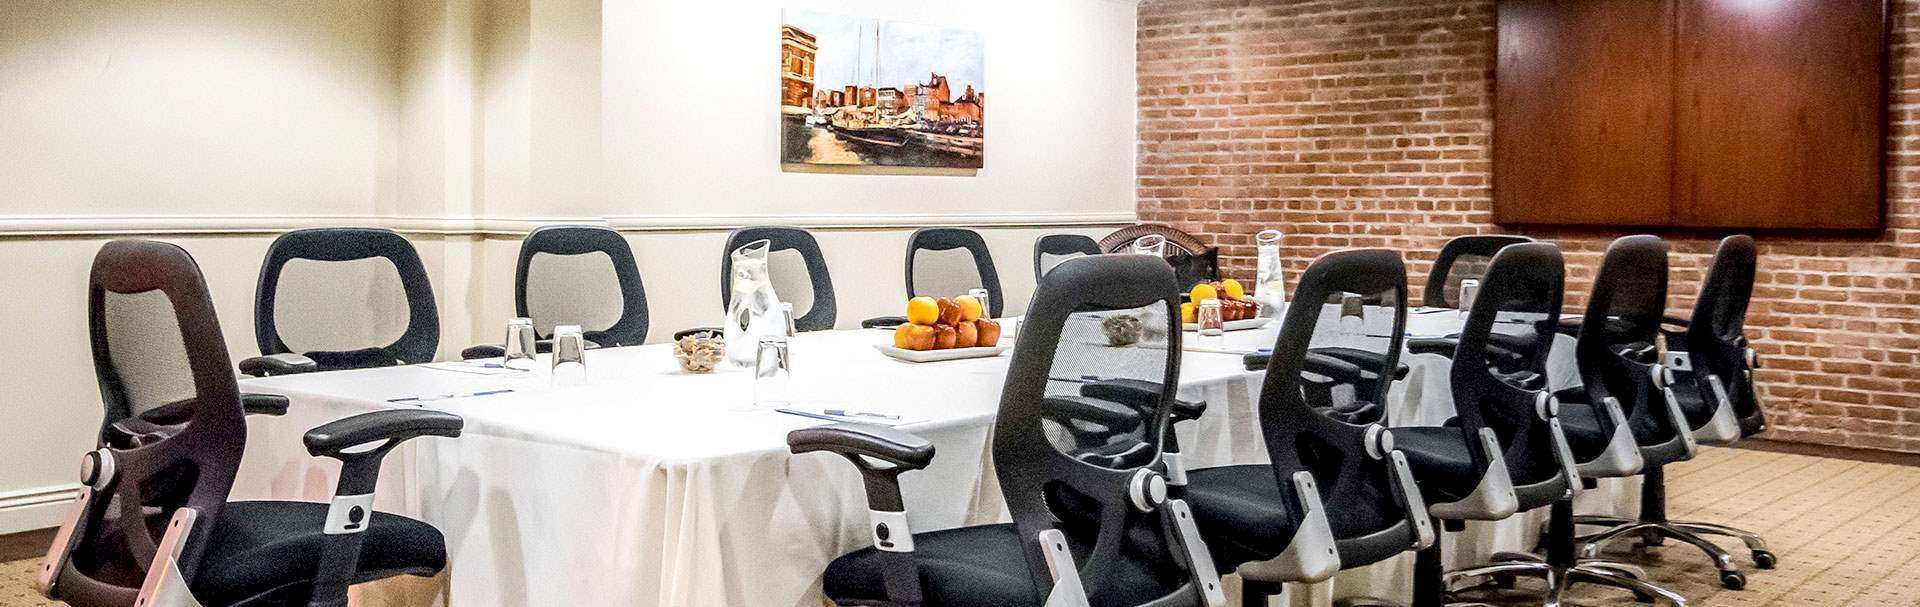 Meetings Venues at Inn at Henderson's Wharf Baltimore, Maryland